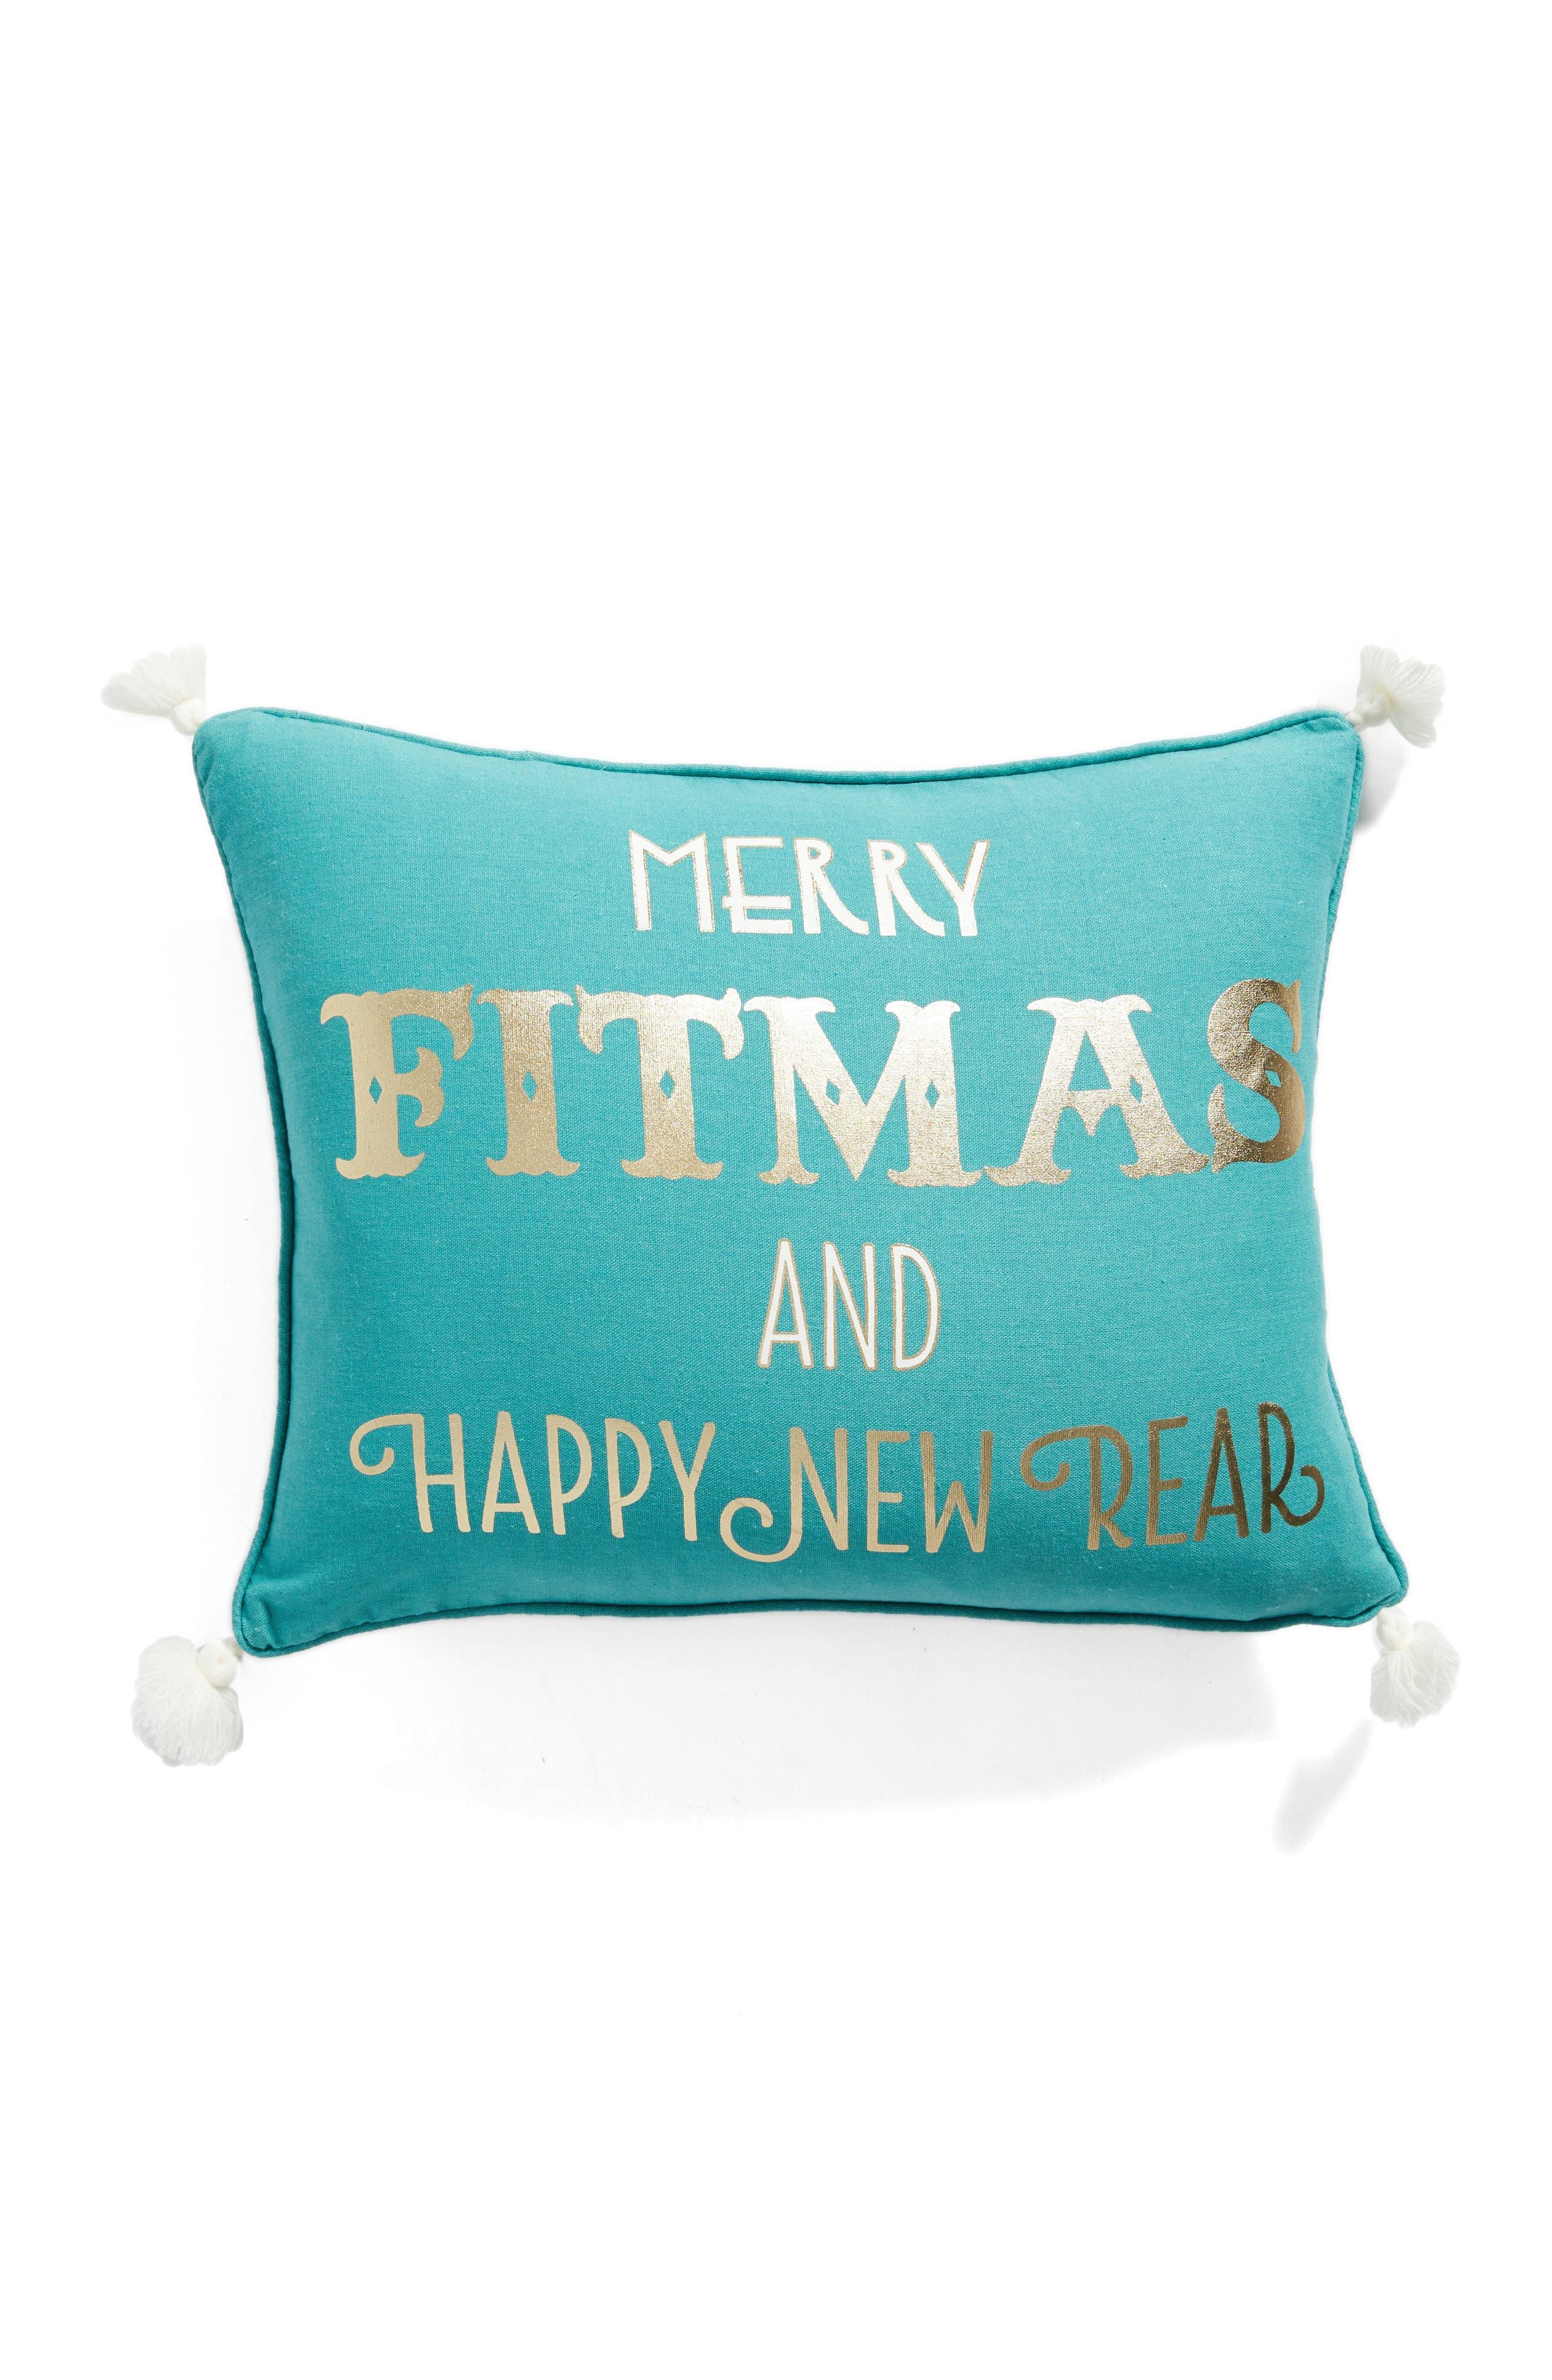 Merry Fitmas Pillow,                             Main thumbnail 1, color,                             400